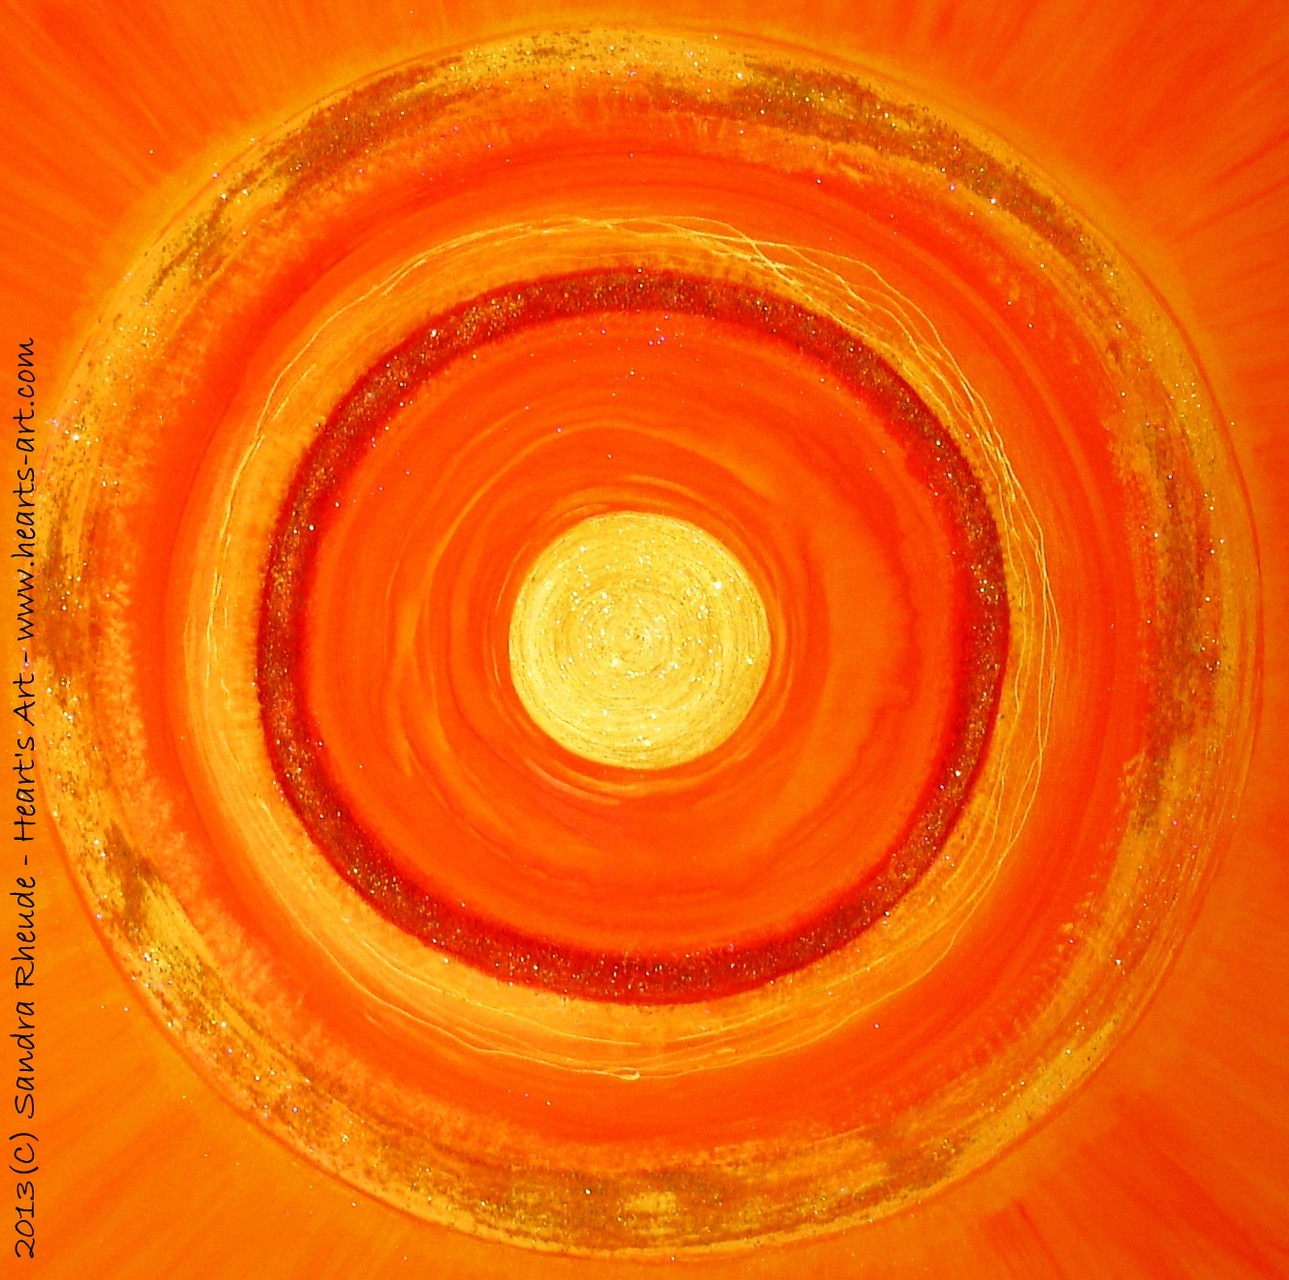 'Auftragsarbeit' - 2013/70 - Acryl/MixedMedia auf Leinwand - 100 x 100 x 4 cm - verkauft (Ulm)